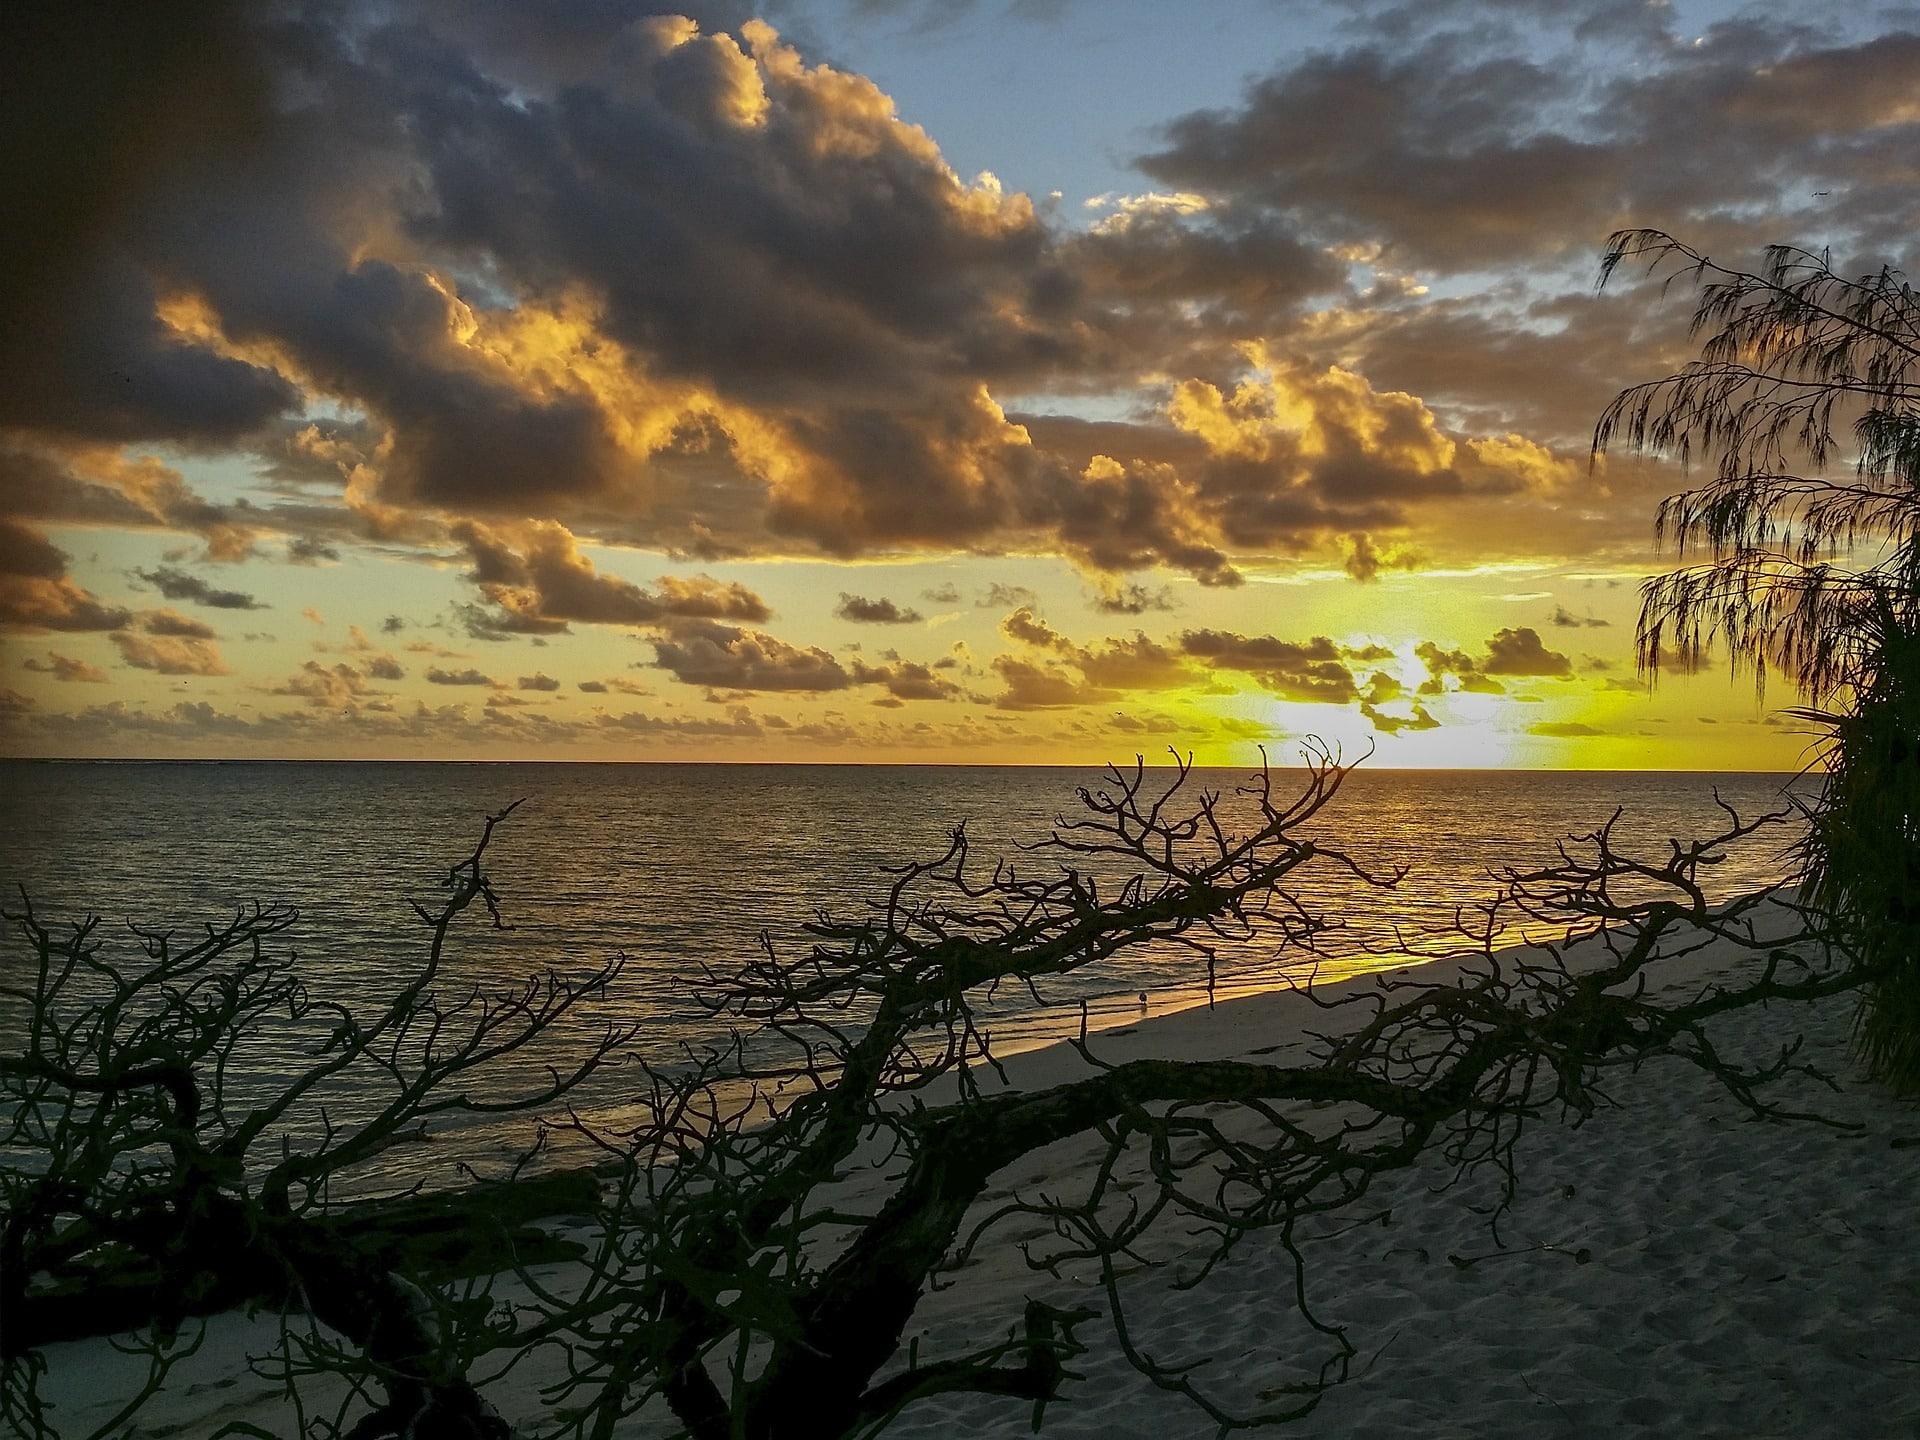 AU sunset